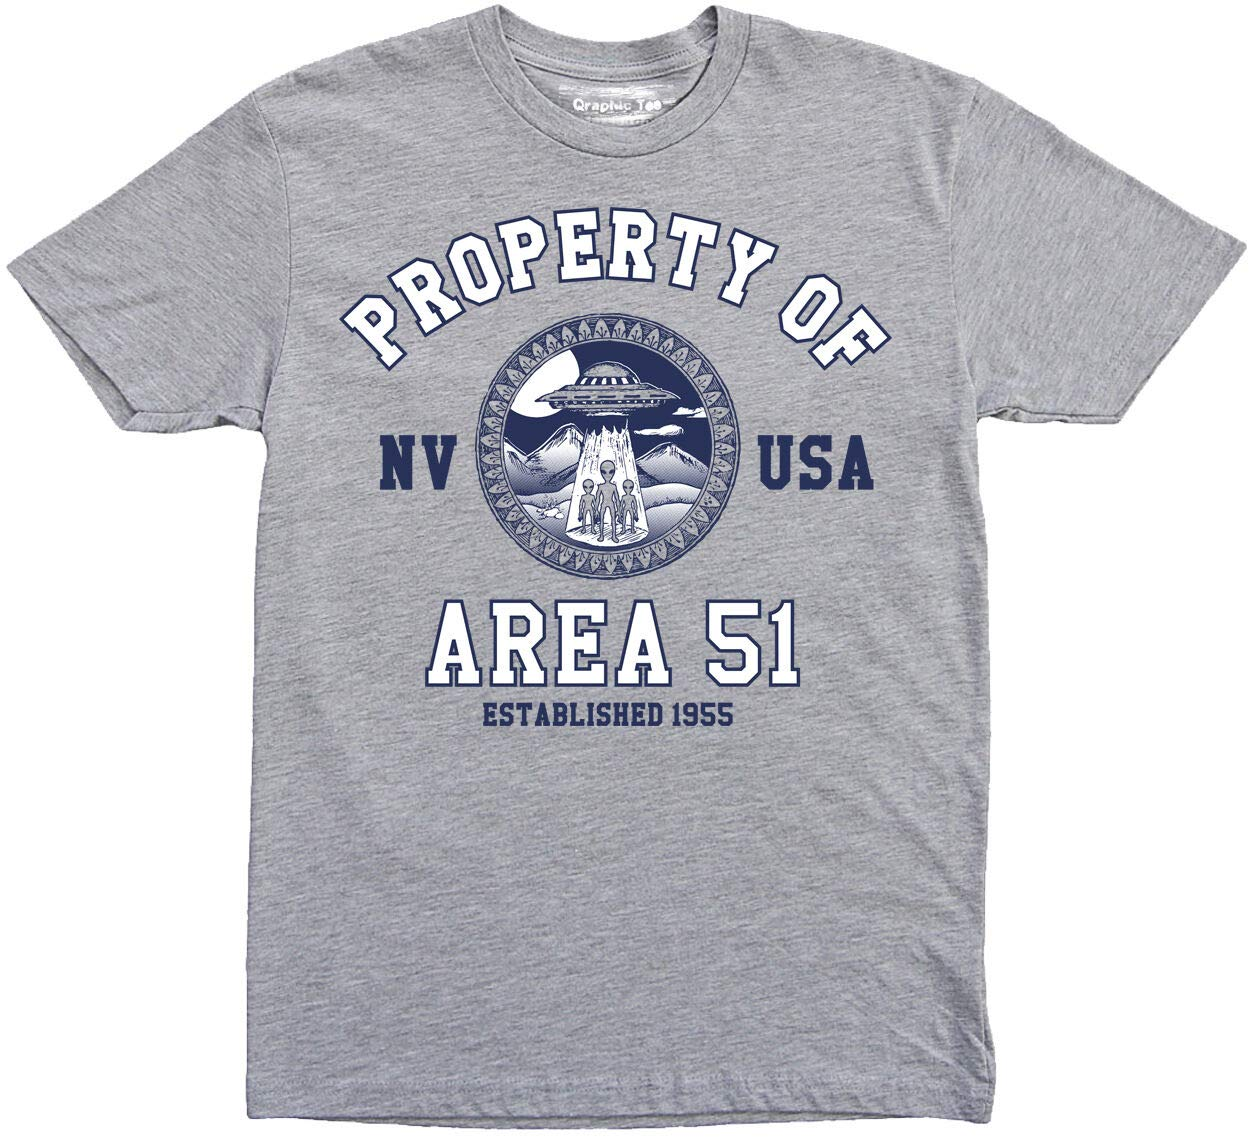 Area 51 T Shirt, Property Of Area 51 T-shirt, Ufo T-shirt